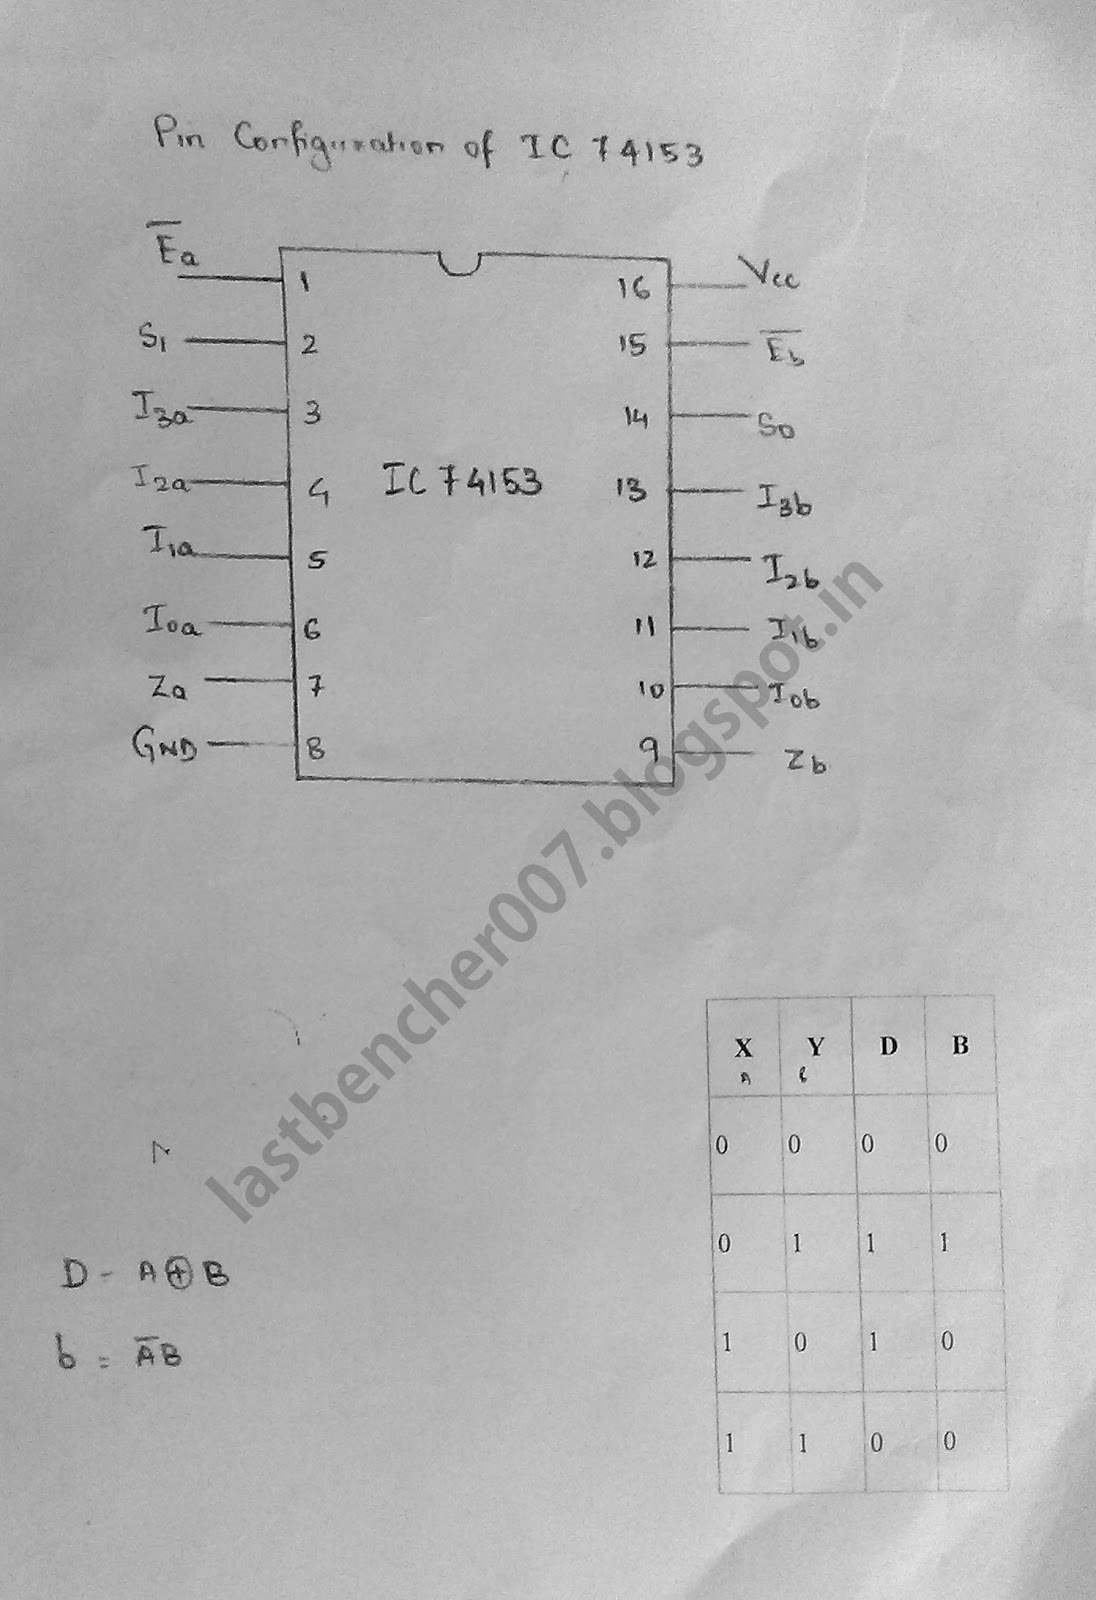 Subtractor Using 41 Mux The Last Bencher Block Diagram Or Logic Of 4x1 Multiplexer